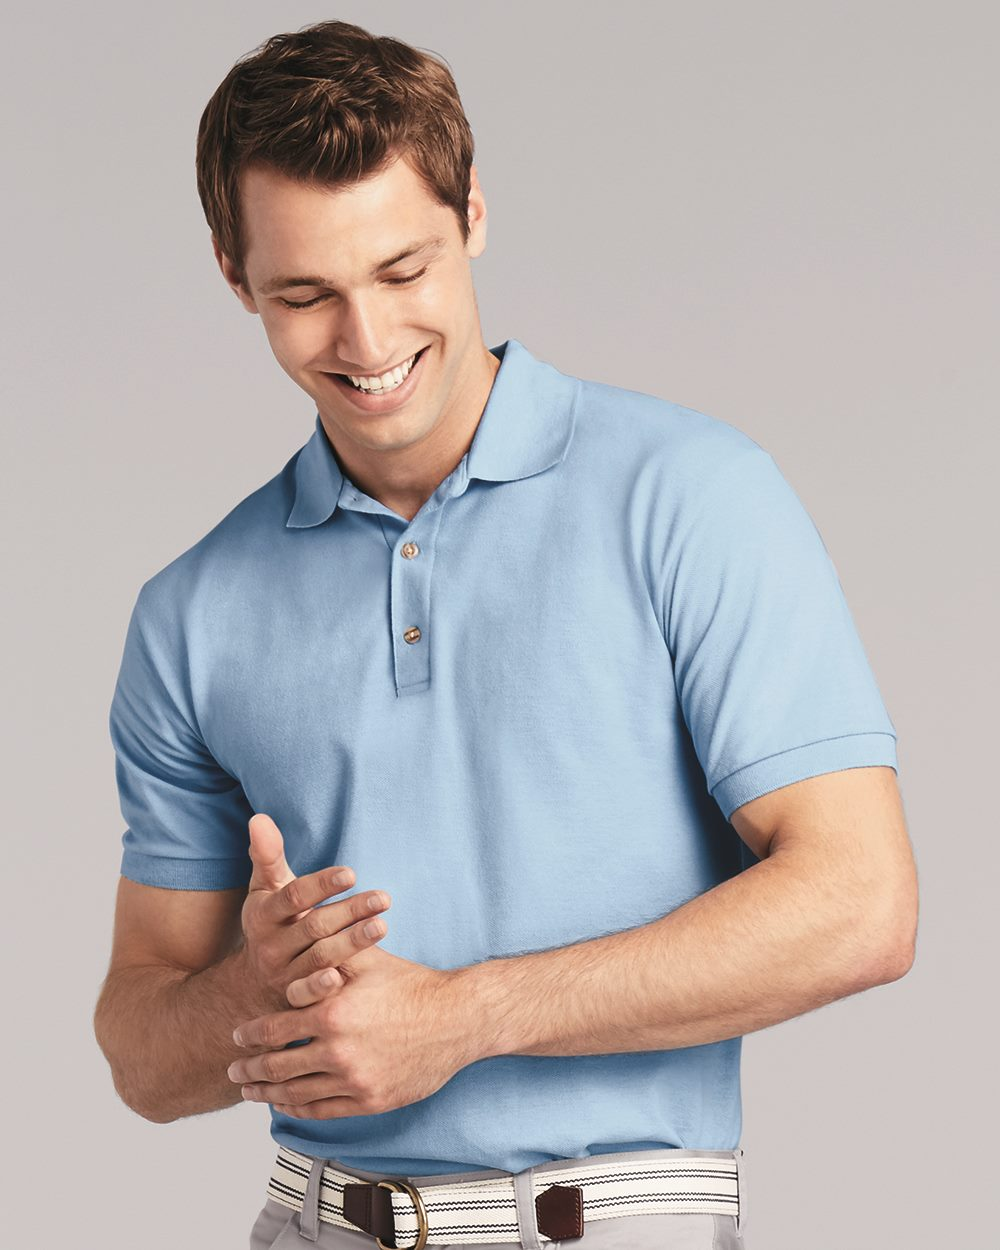 Gildan 3800 Ultra Cotton Ringspun Pique Sport Shir